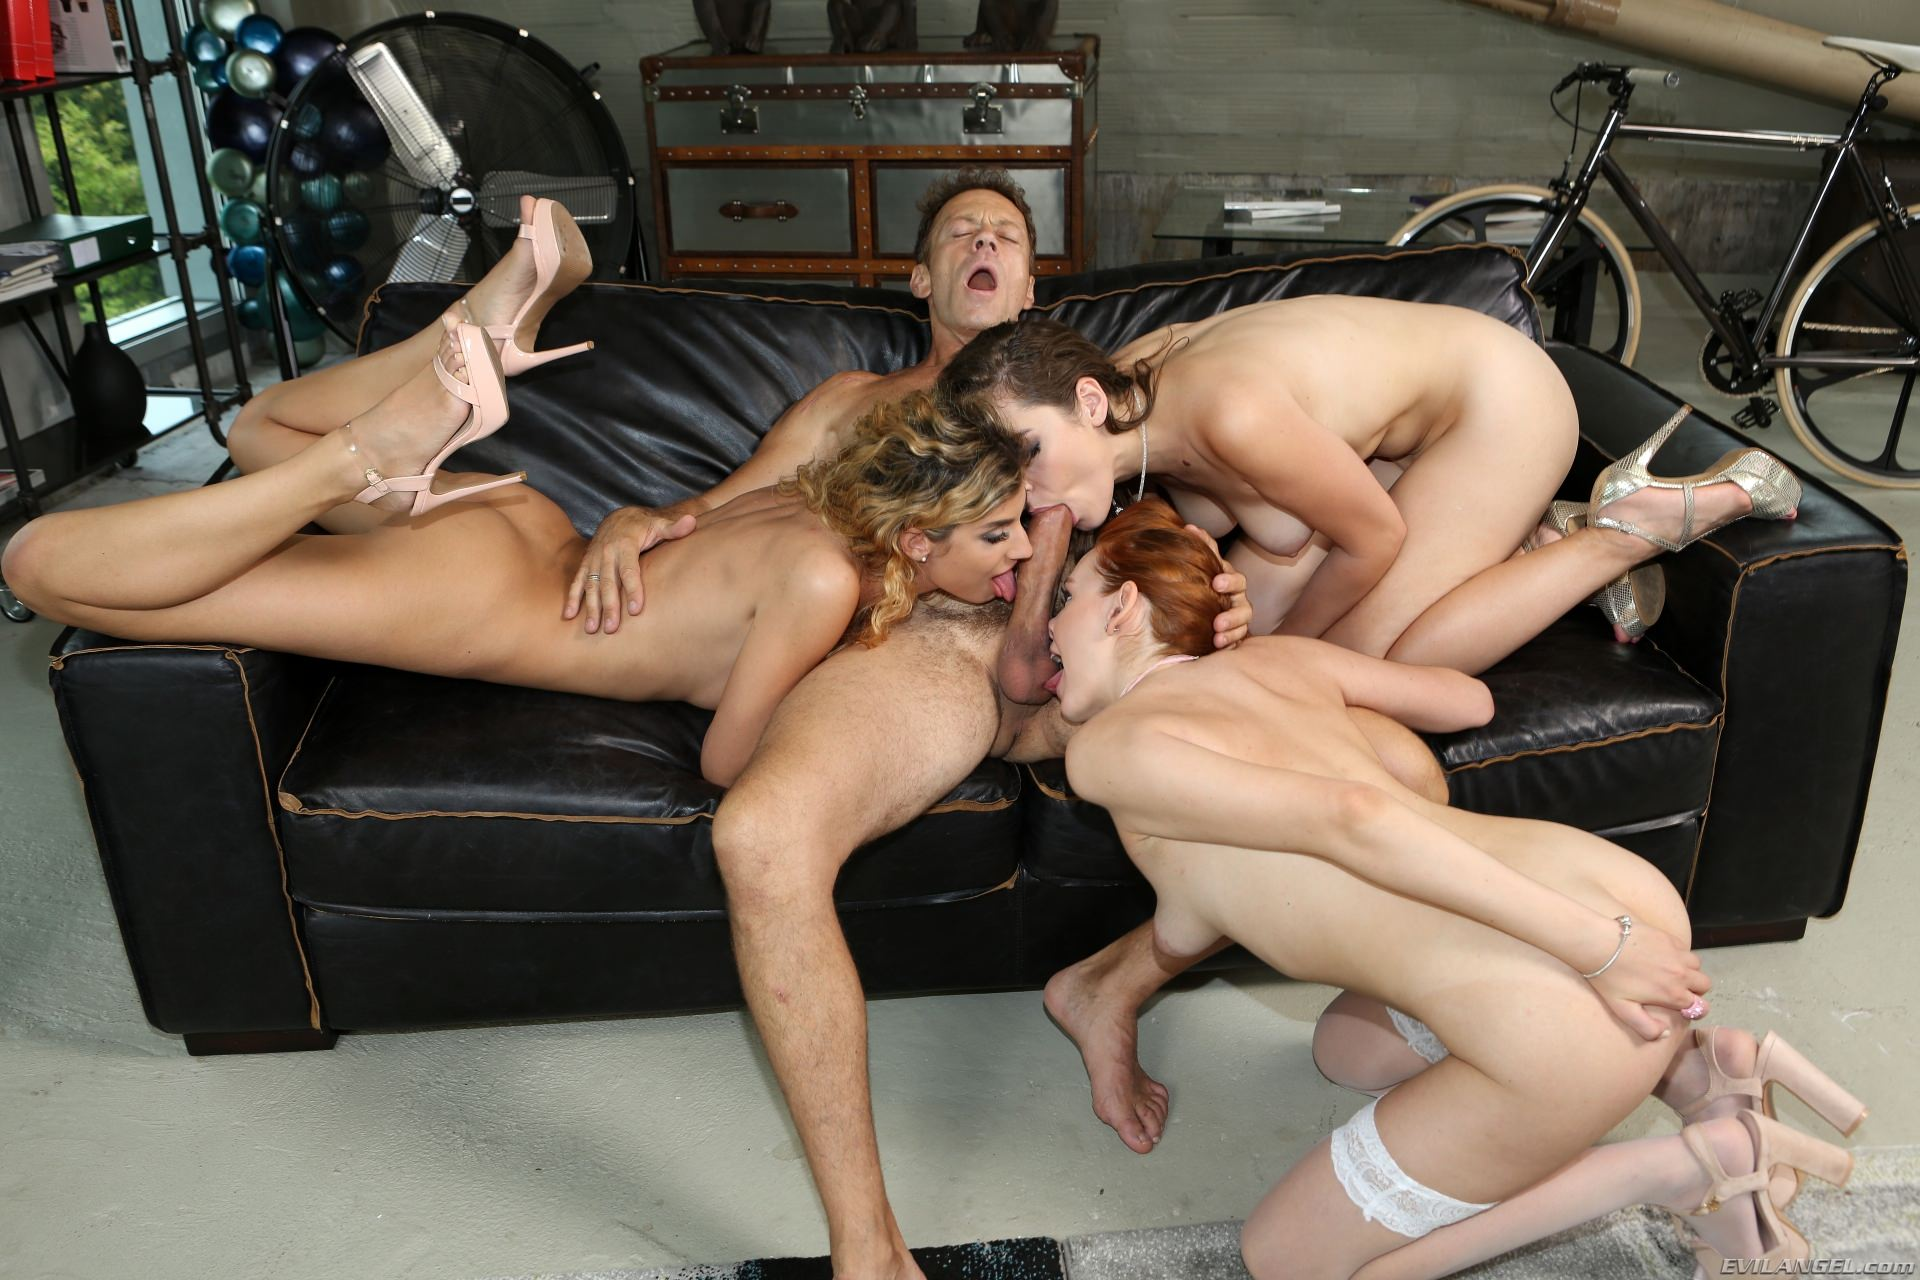 Evil Angel 'Rocco Sex Analyst 7' starring Shona River (Photo 55)